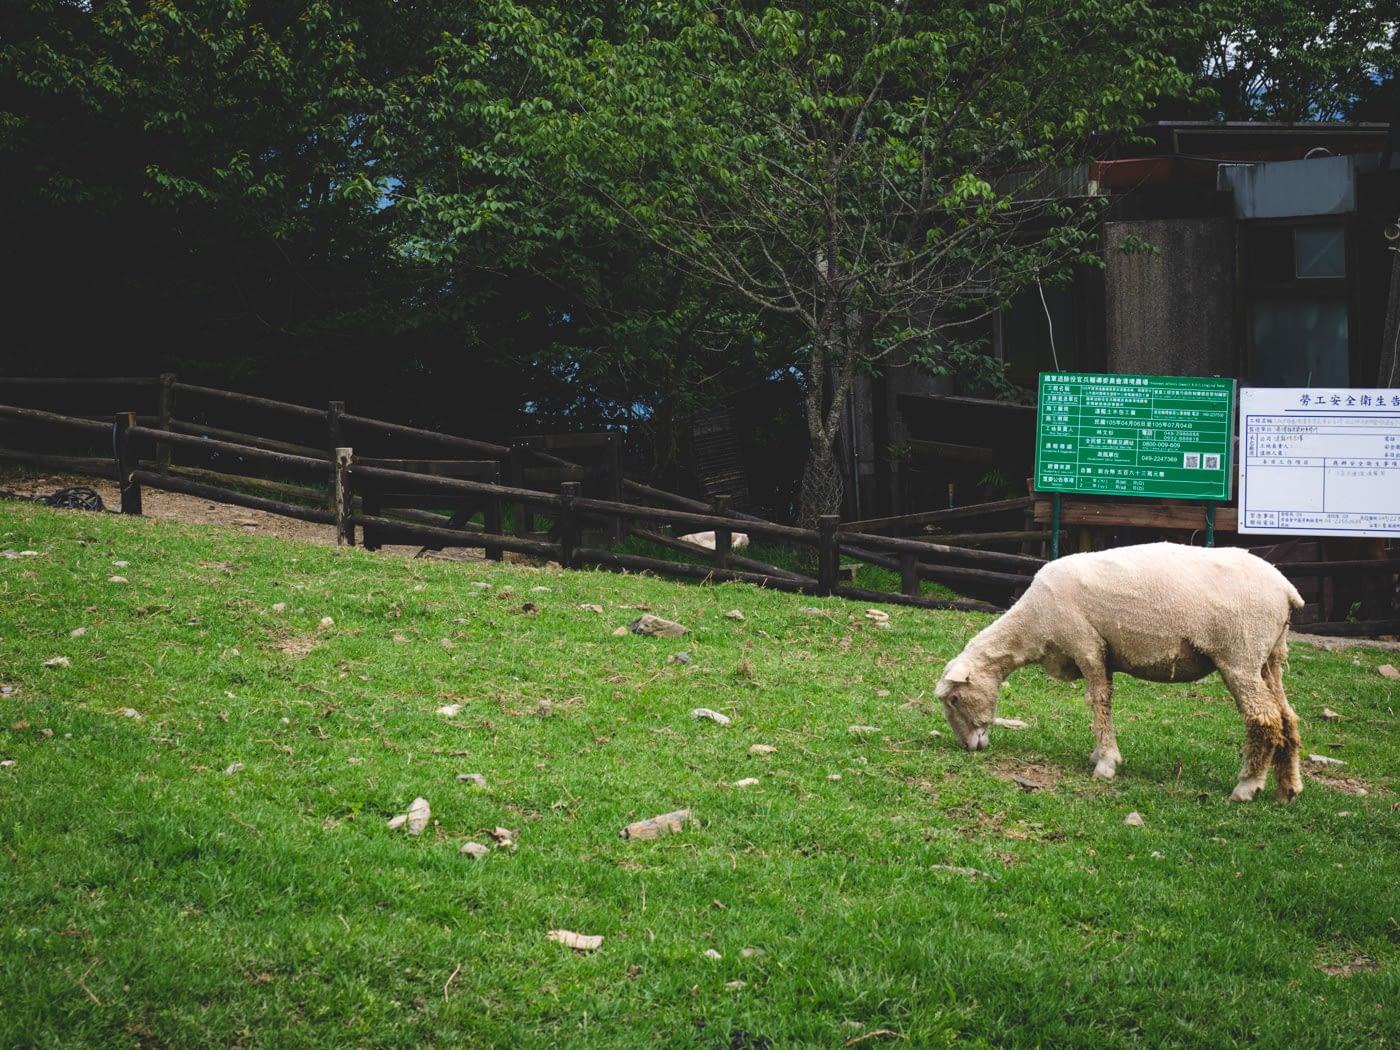 Taiwan - Qingjing Farm - Shaved down sheep